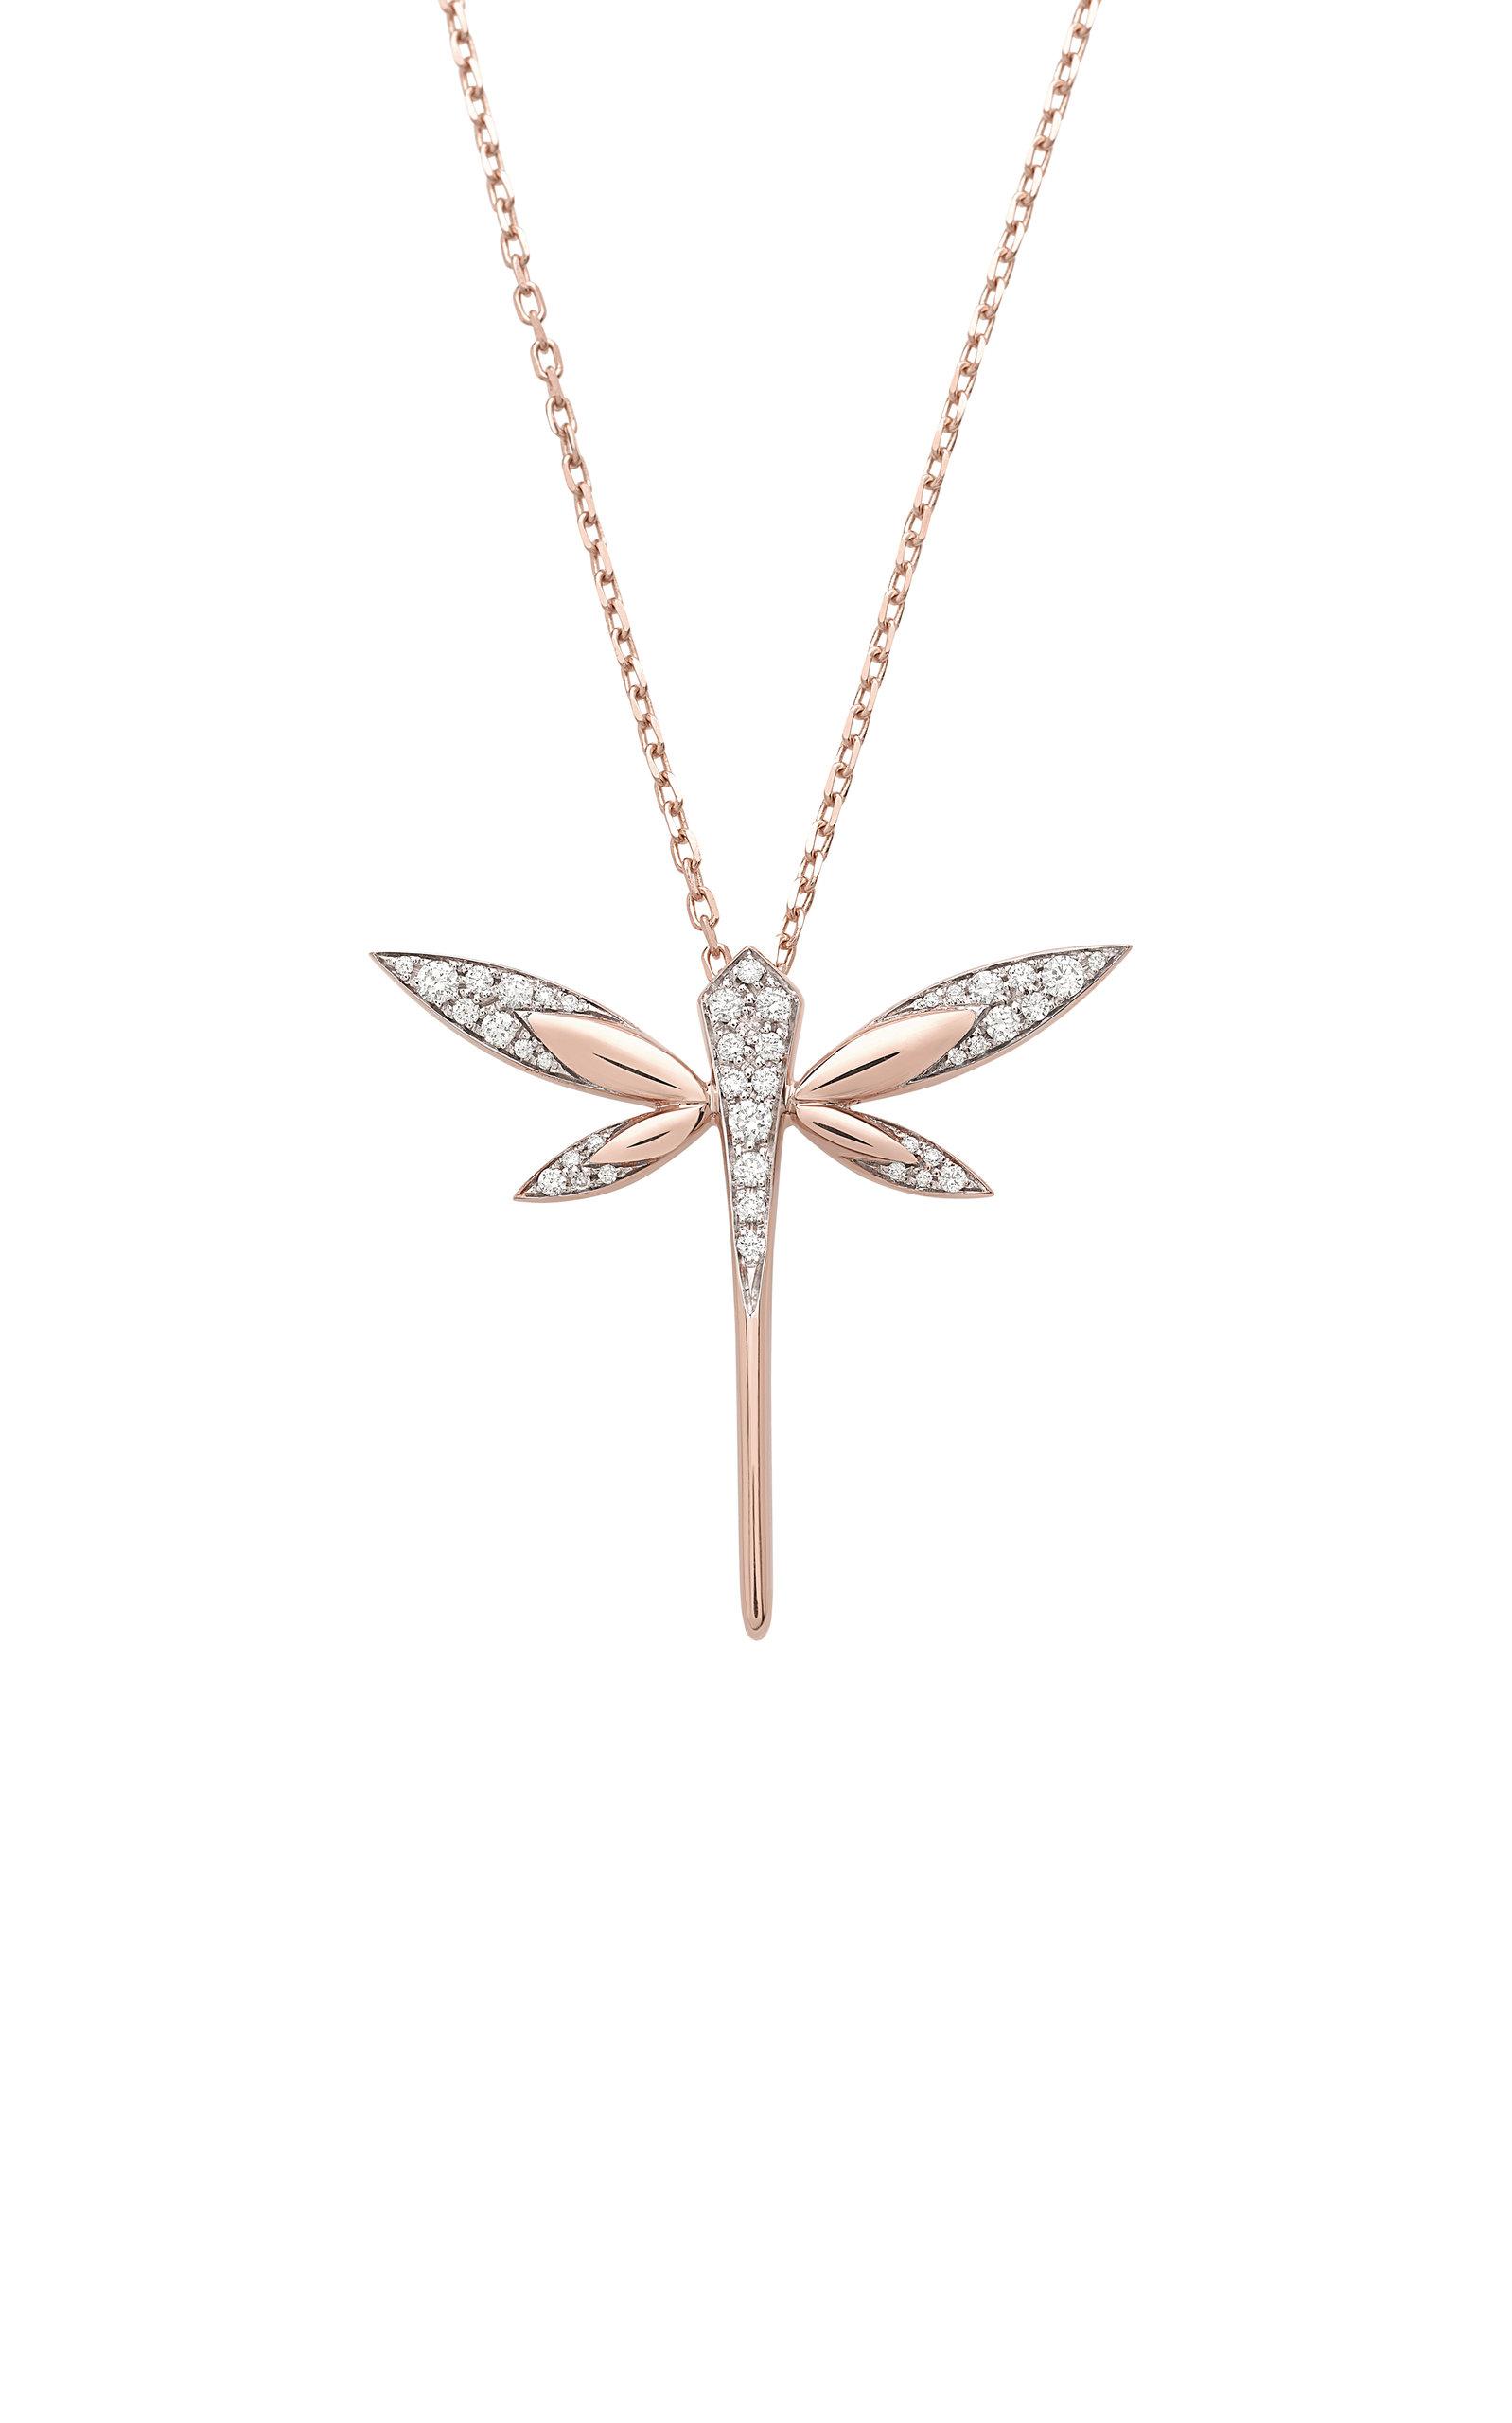 Women's Medium Dragonfly 18K Rose Gold Diamond Necklace